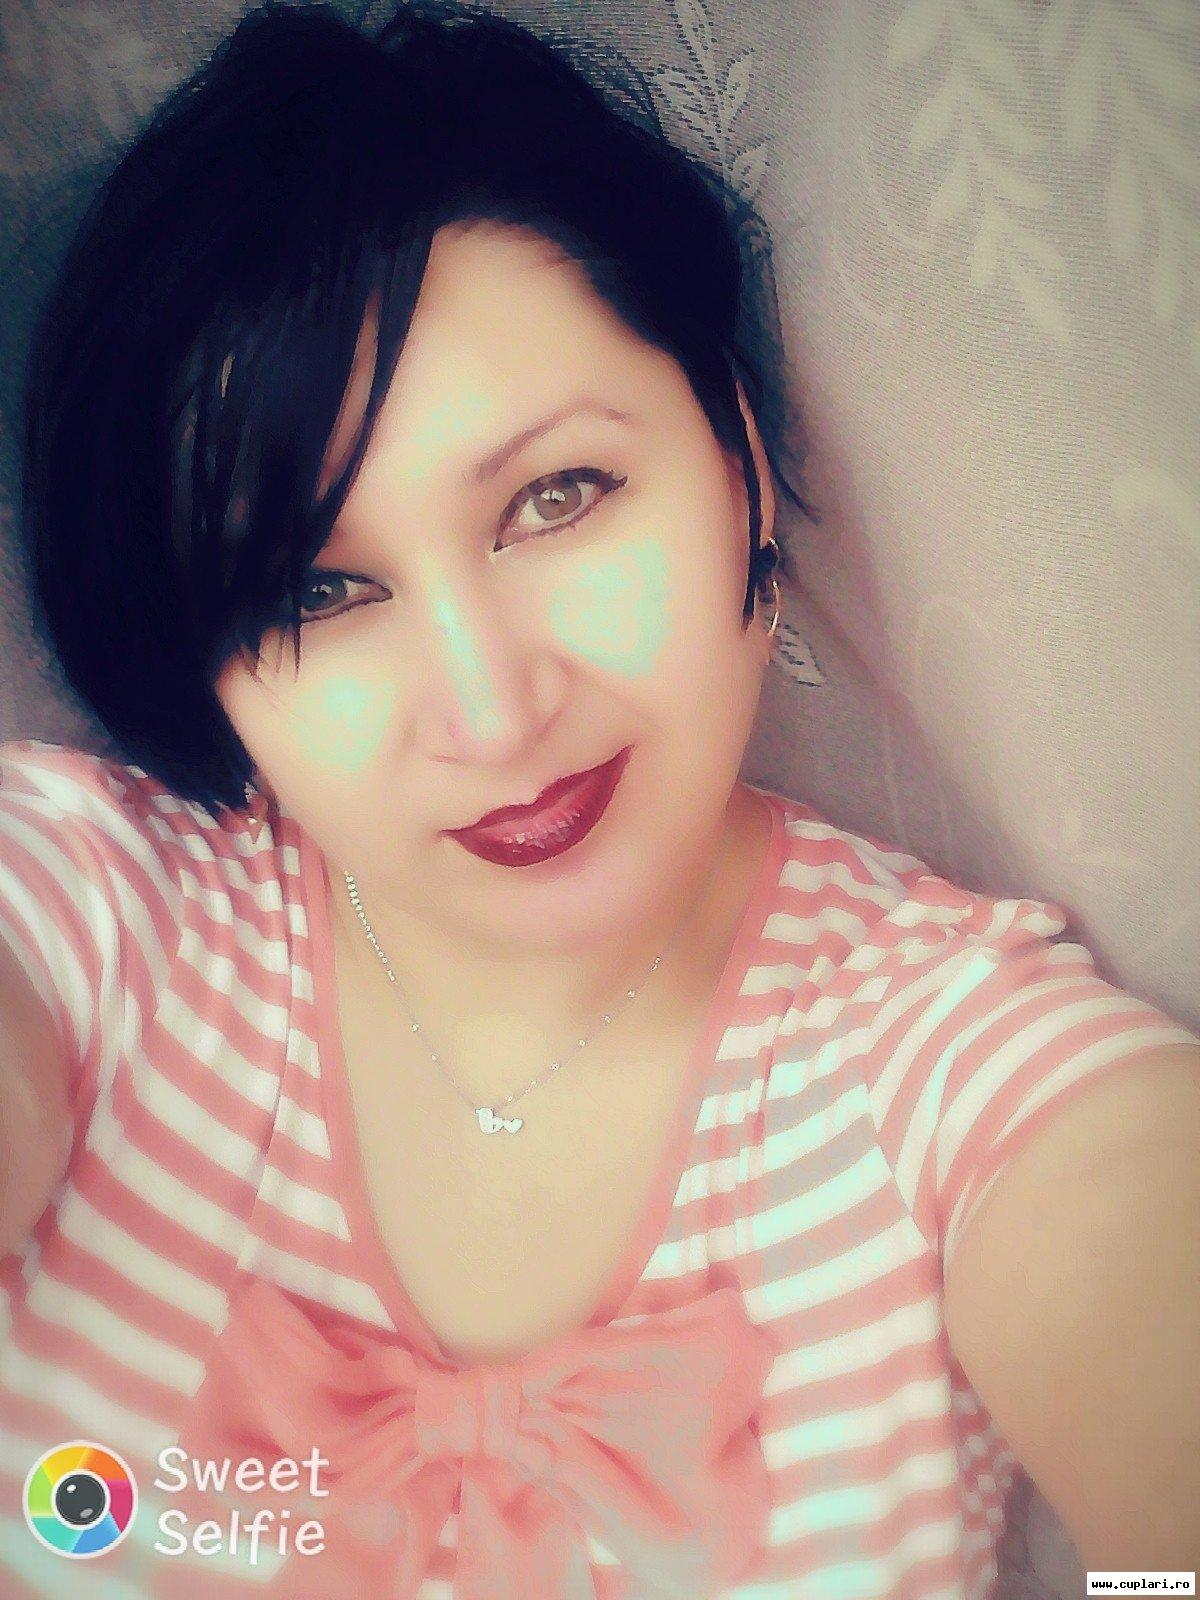 intalneste femei din fundulea chat & dating online din românia